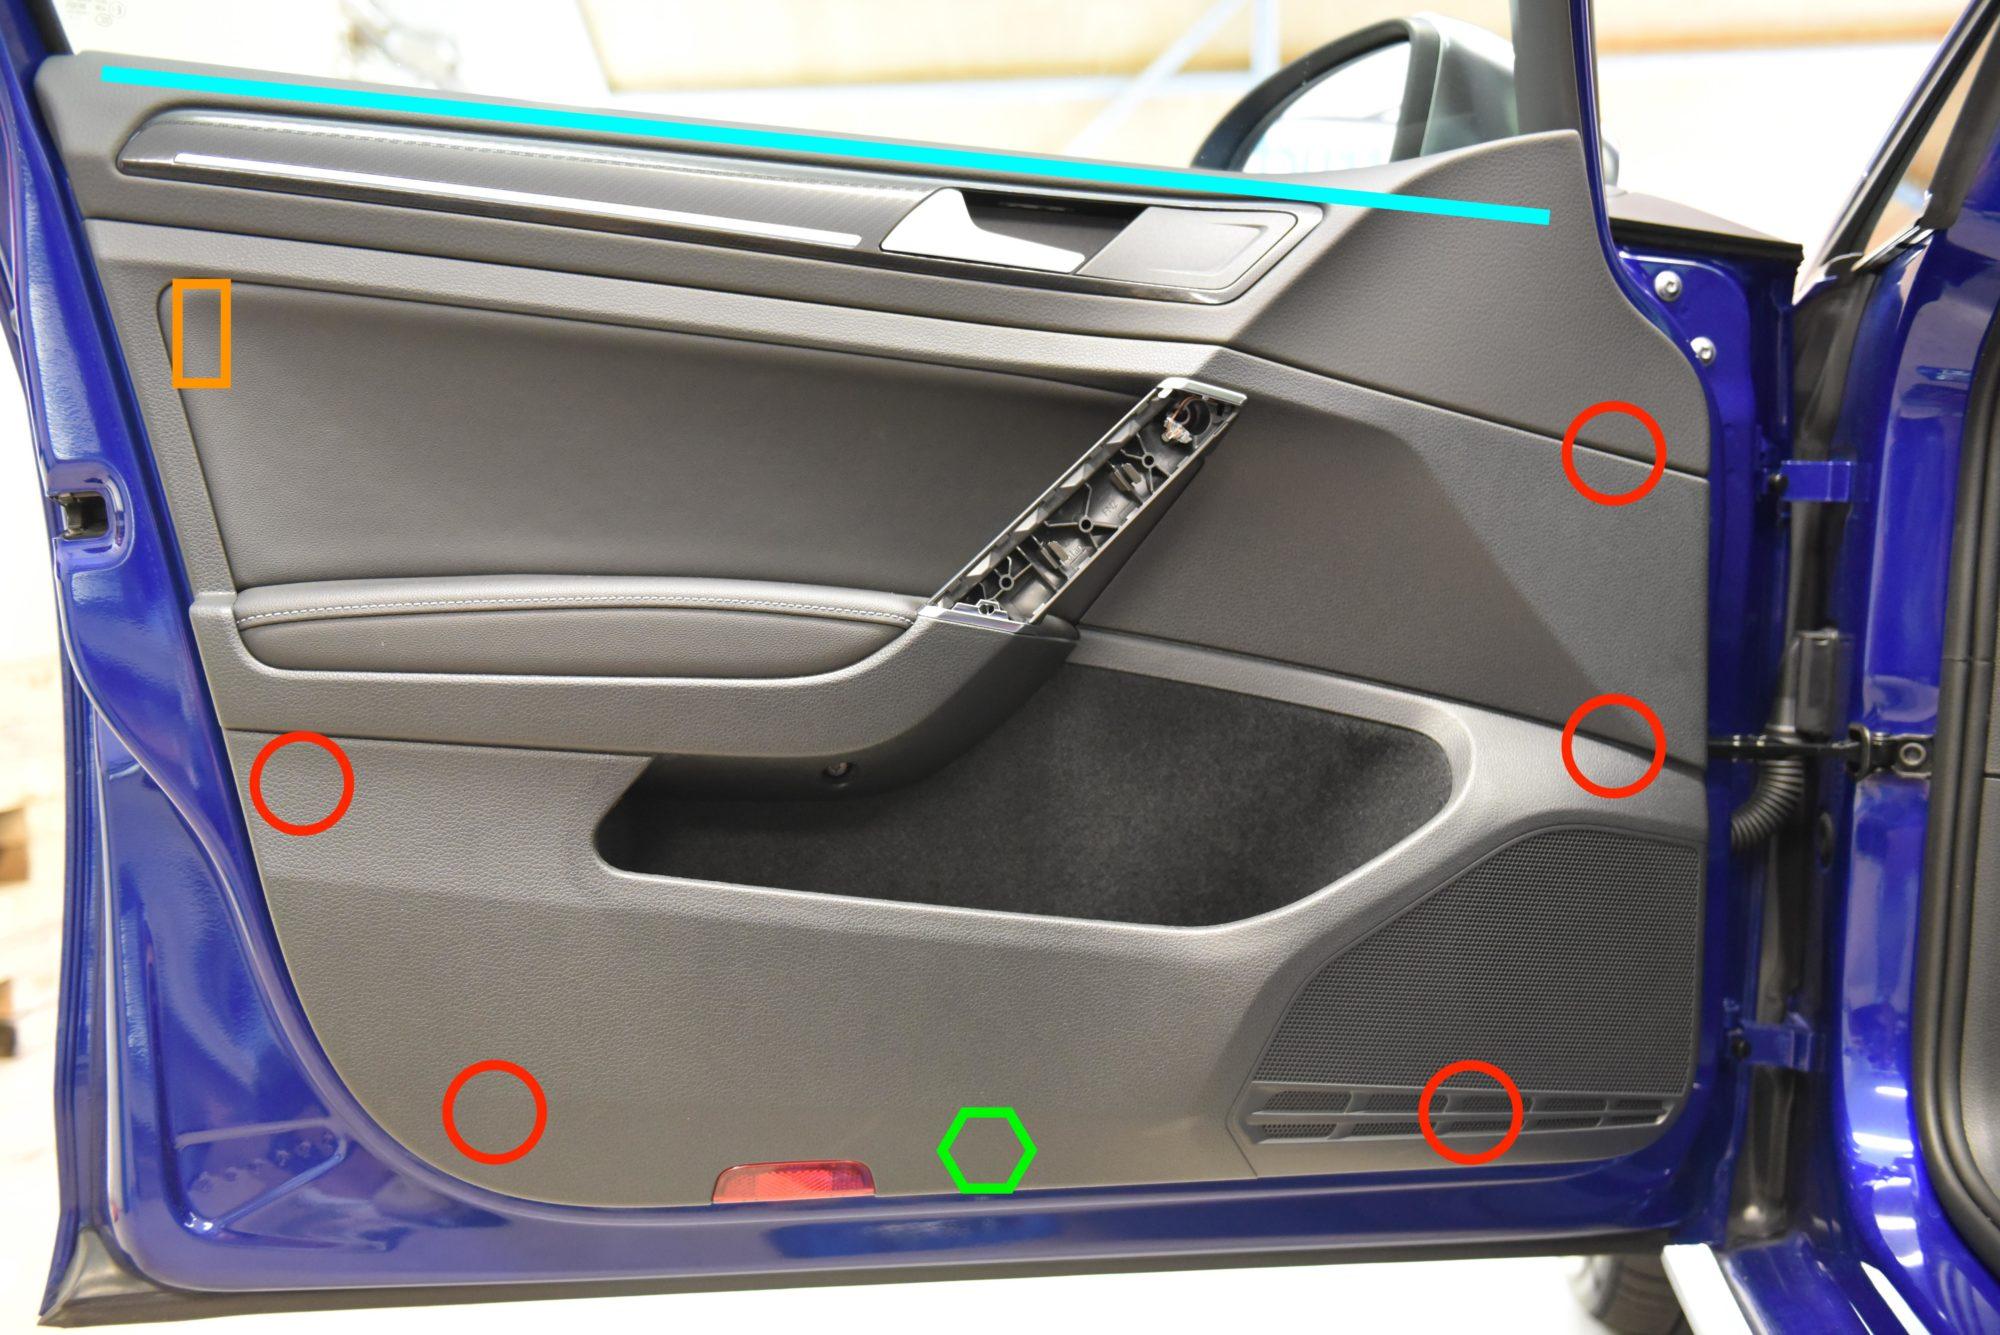 MK7 Golf Front Door Trim Card Removal